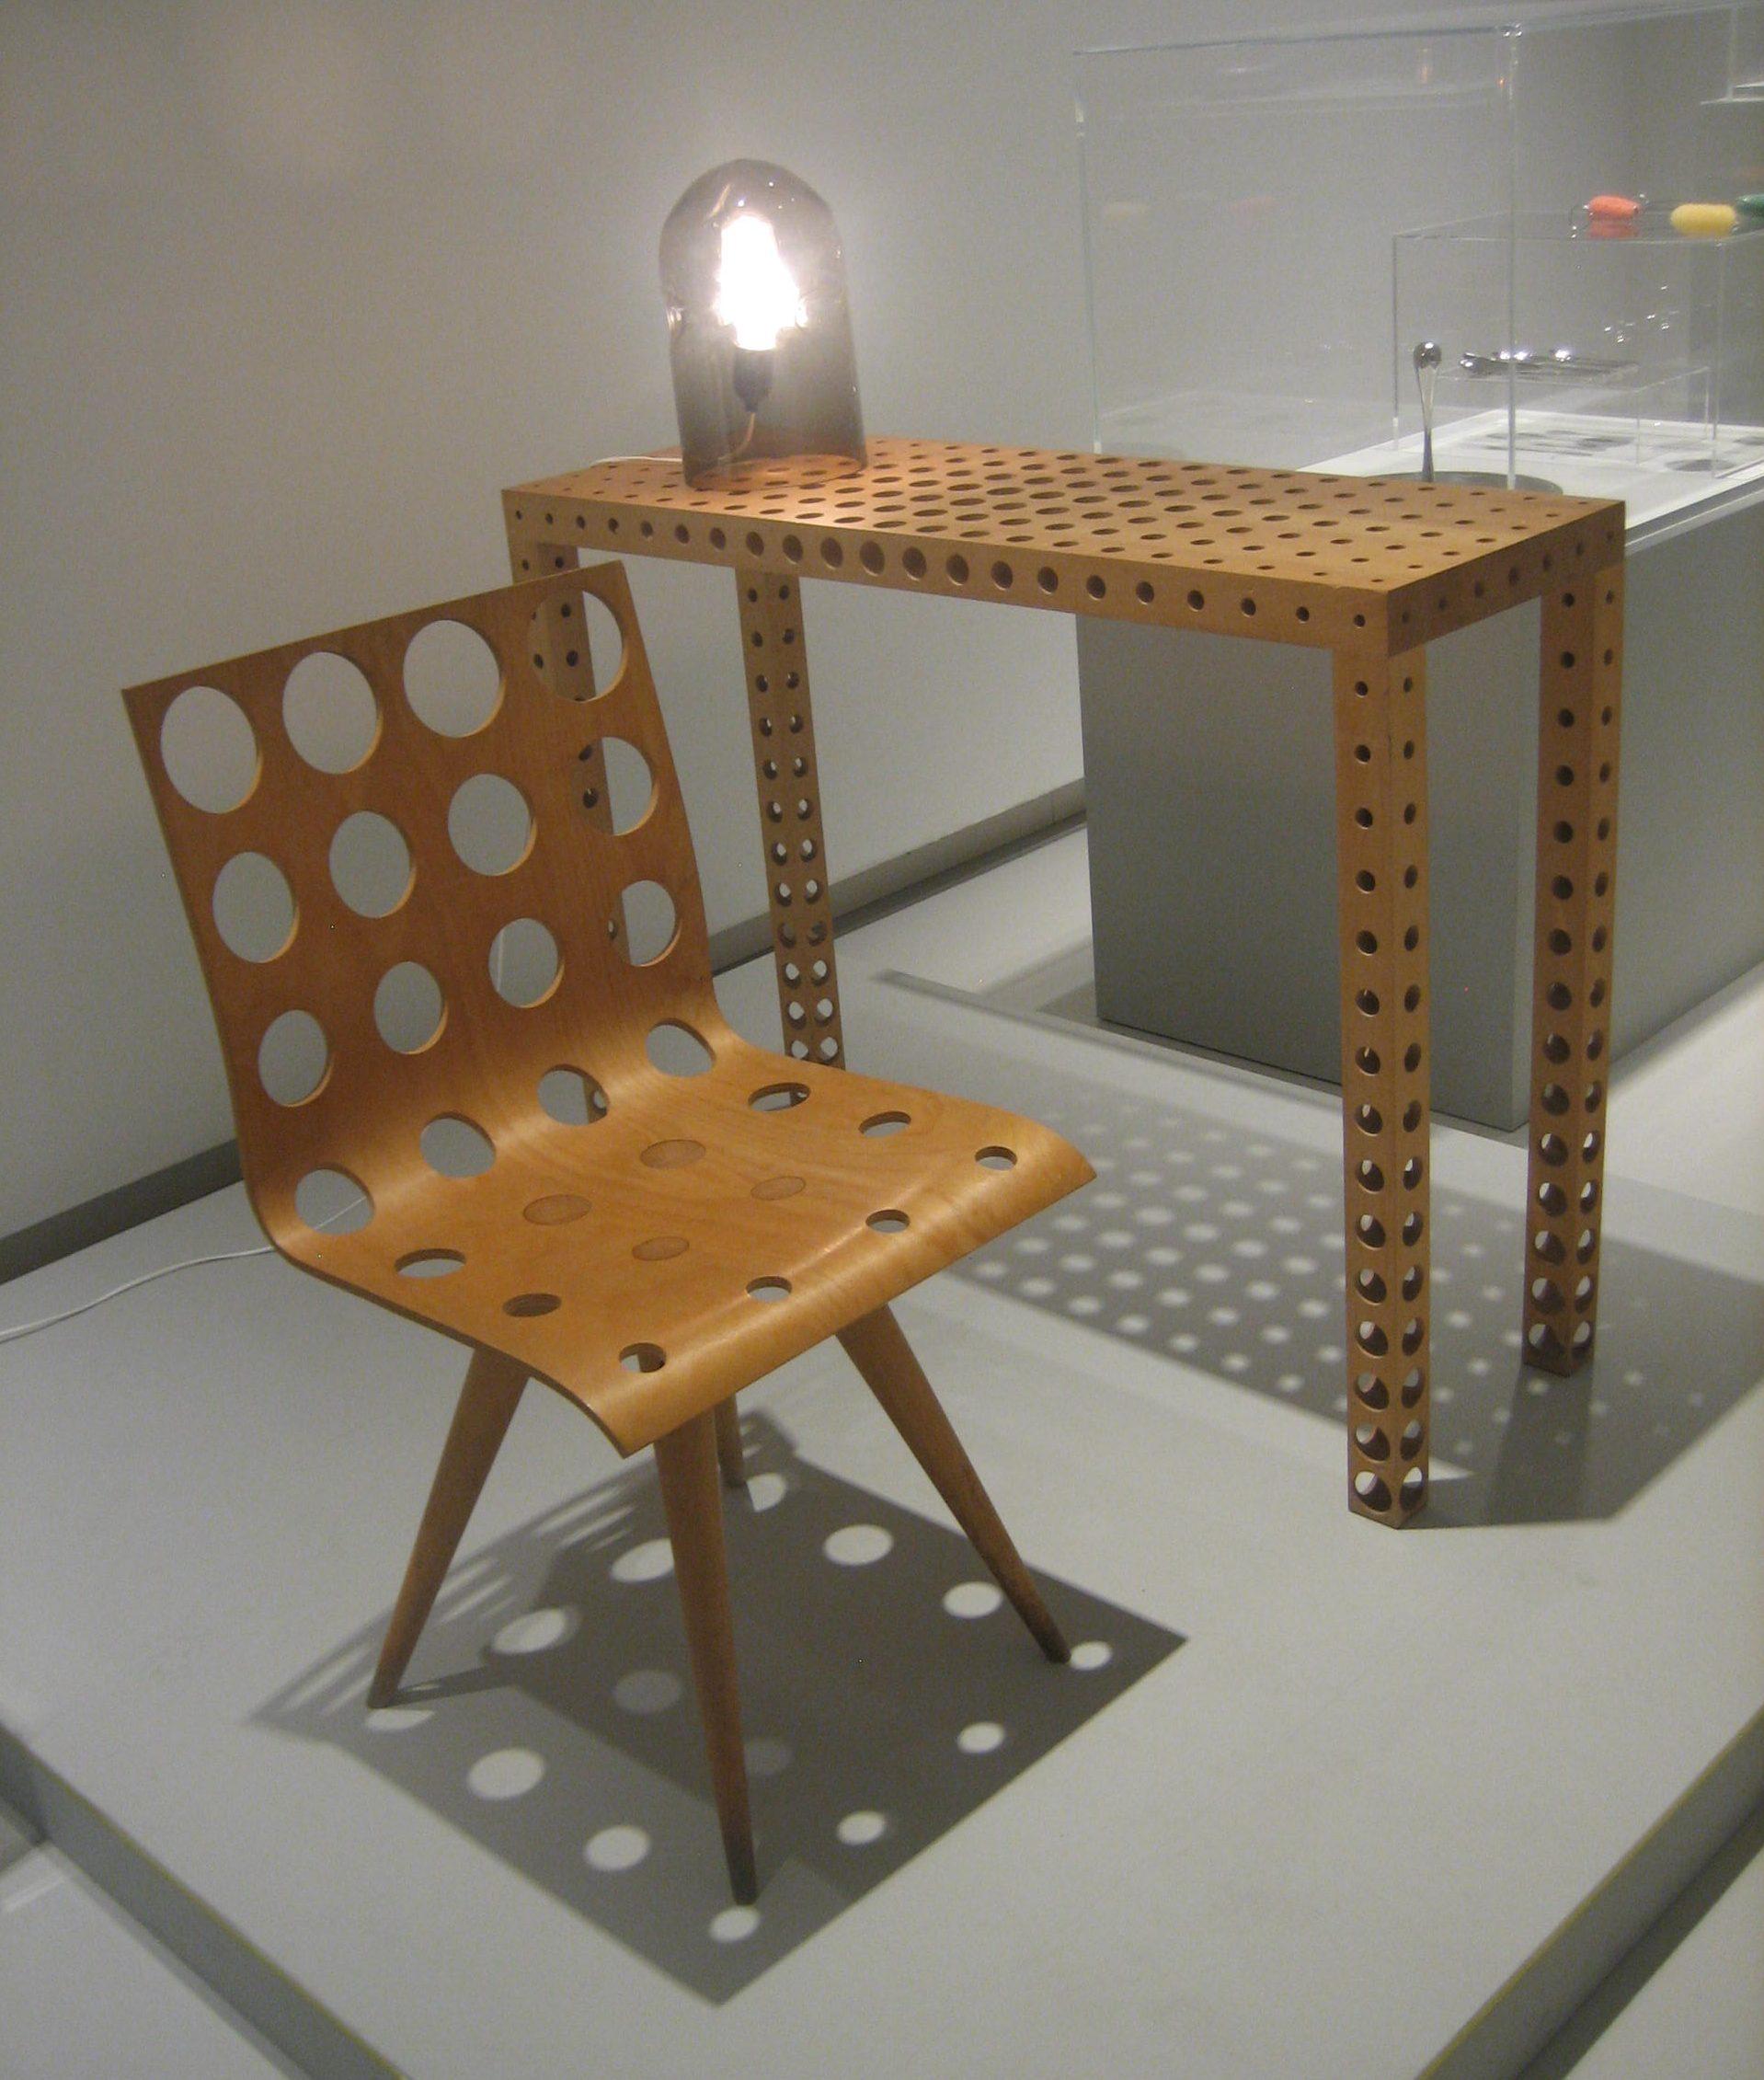 Gijs Bakker, Chair with Holes no. 2, 1991, Fruit Table with Holes, 1993 en Glass Lamp, 1978. Foto Esther Doornbusch, 2 december 2018©